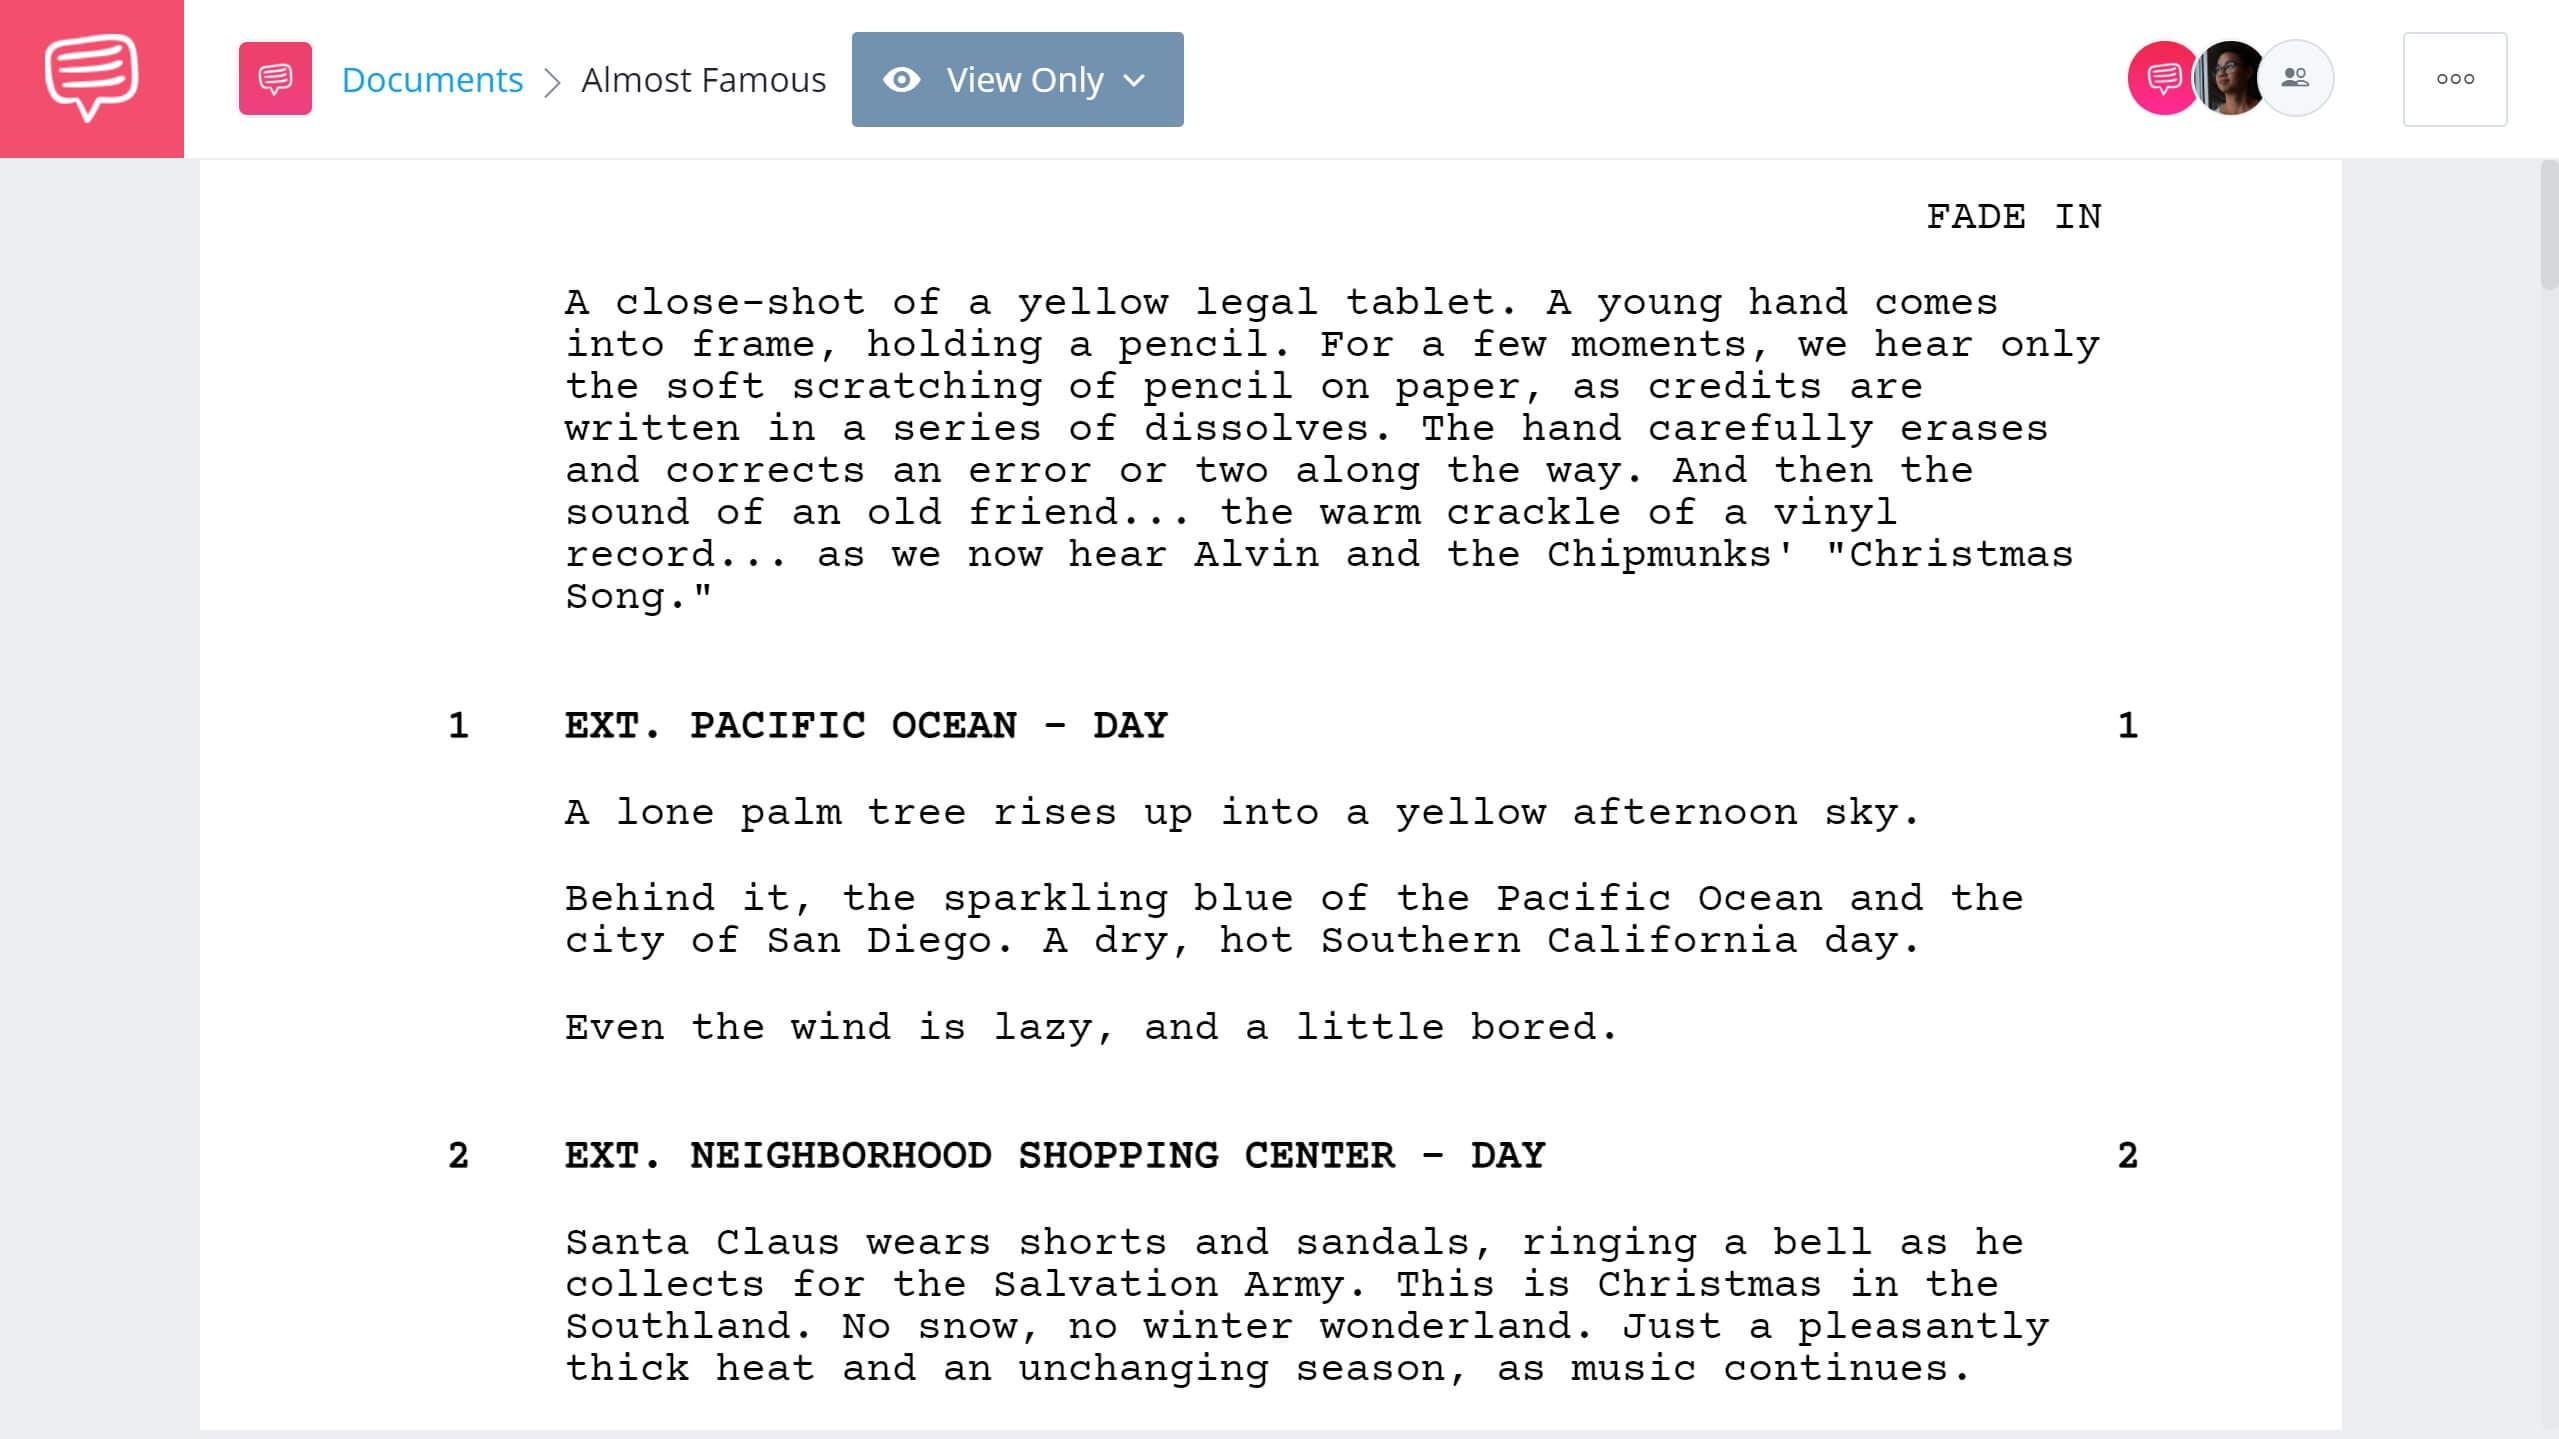 Best Original Screenplay Academy Award - Almost Famous Full Script PDF Download - StudioBinder Screenwriting Software